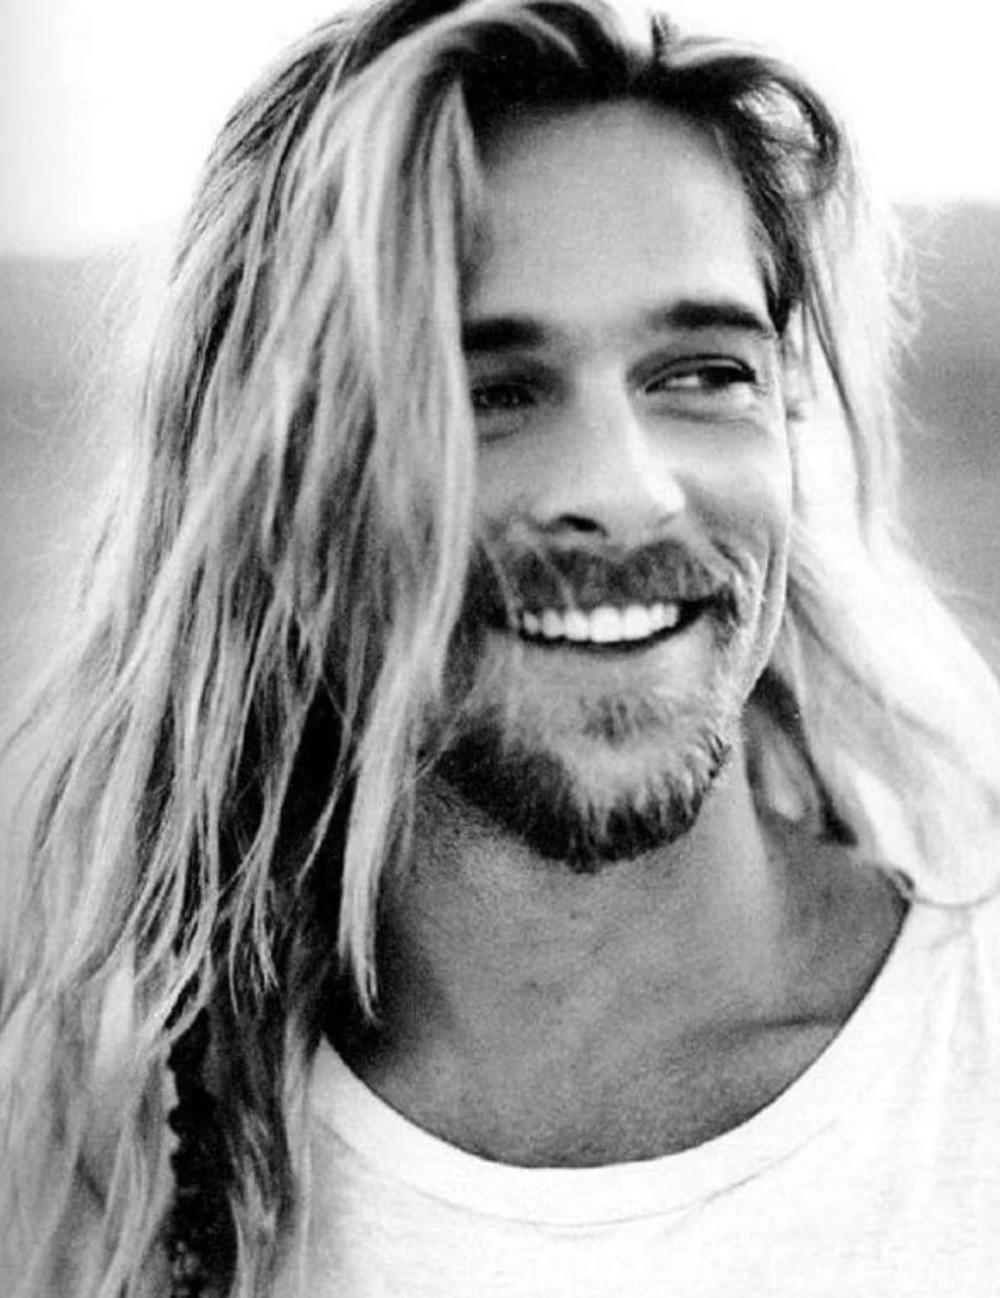 Throwback Brad Pitt 1994 Legends Of The Fall Era Bleached Long Hair Lipstick Alley In 2020 Brad Pitt Long Hair Brad Pitt Brad Pitt Hair